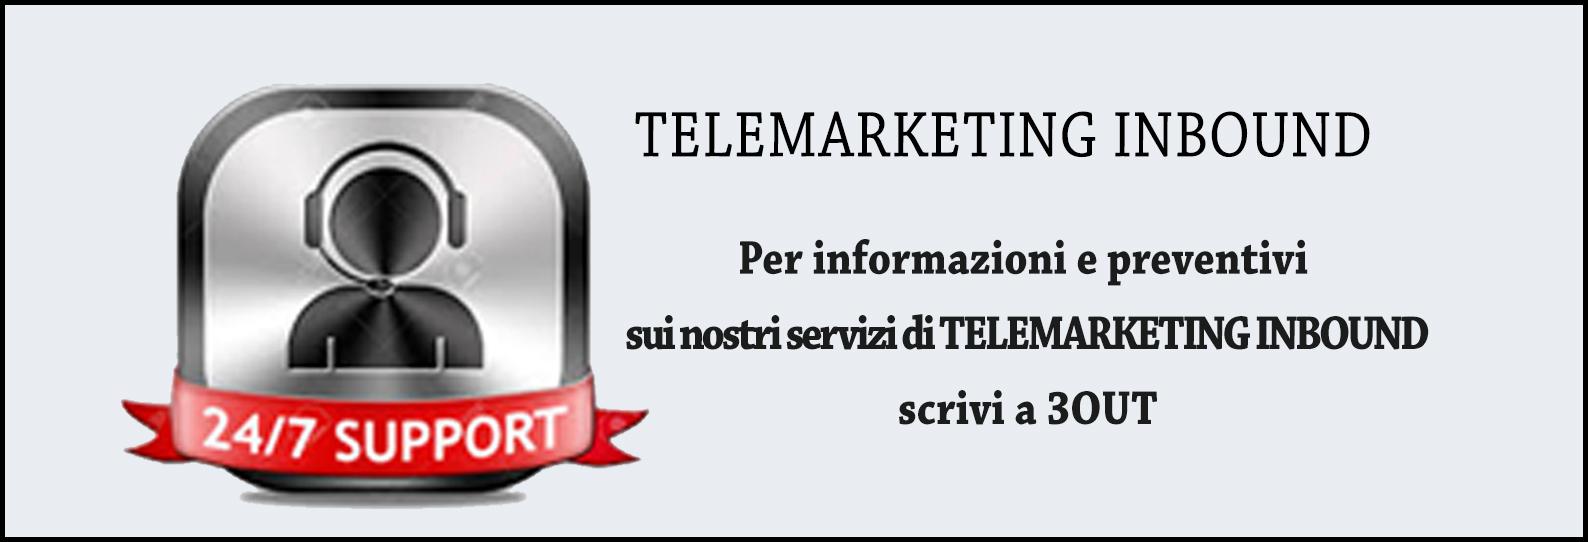 3Out_sito pll_banner_telemarketinginbound